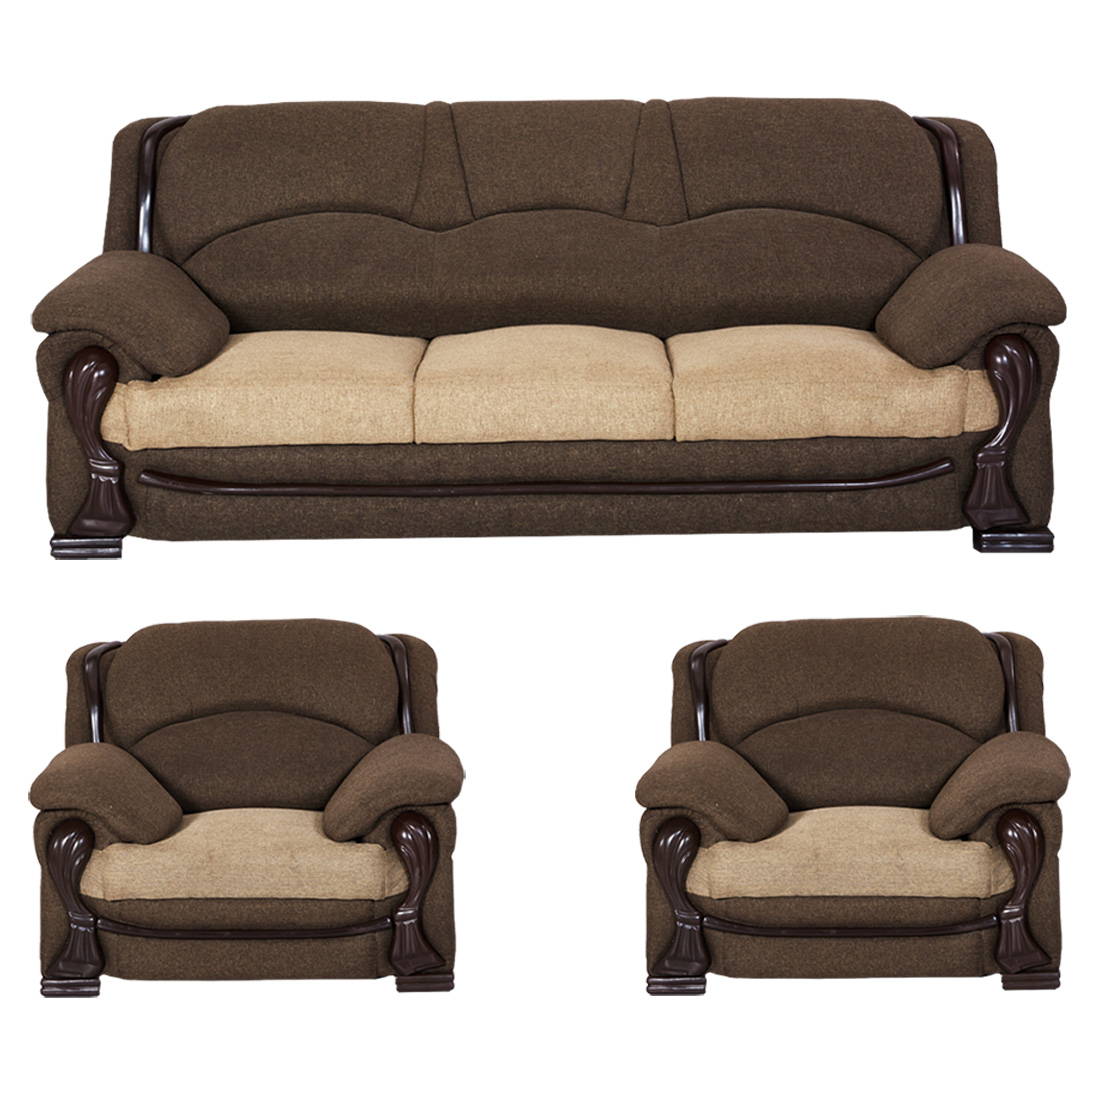 Bharat Lifestyle China Get Fabric 3 + 1 + 1 Golden Brown Sofa Set